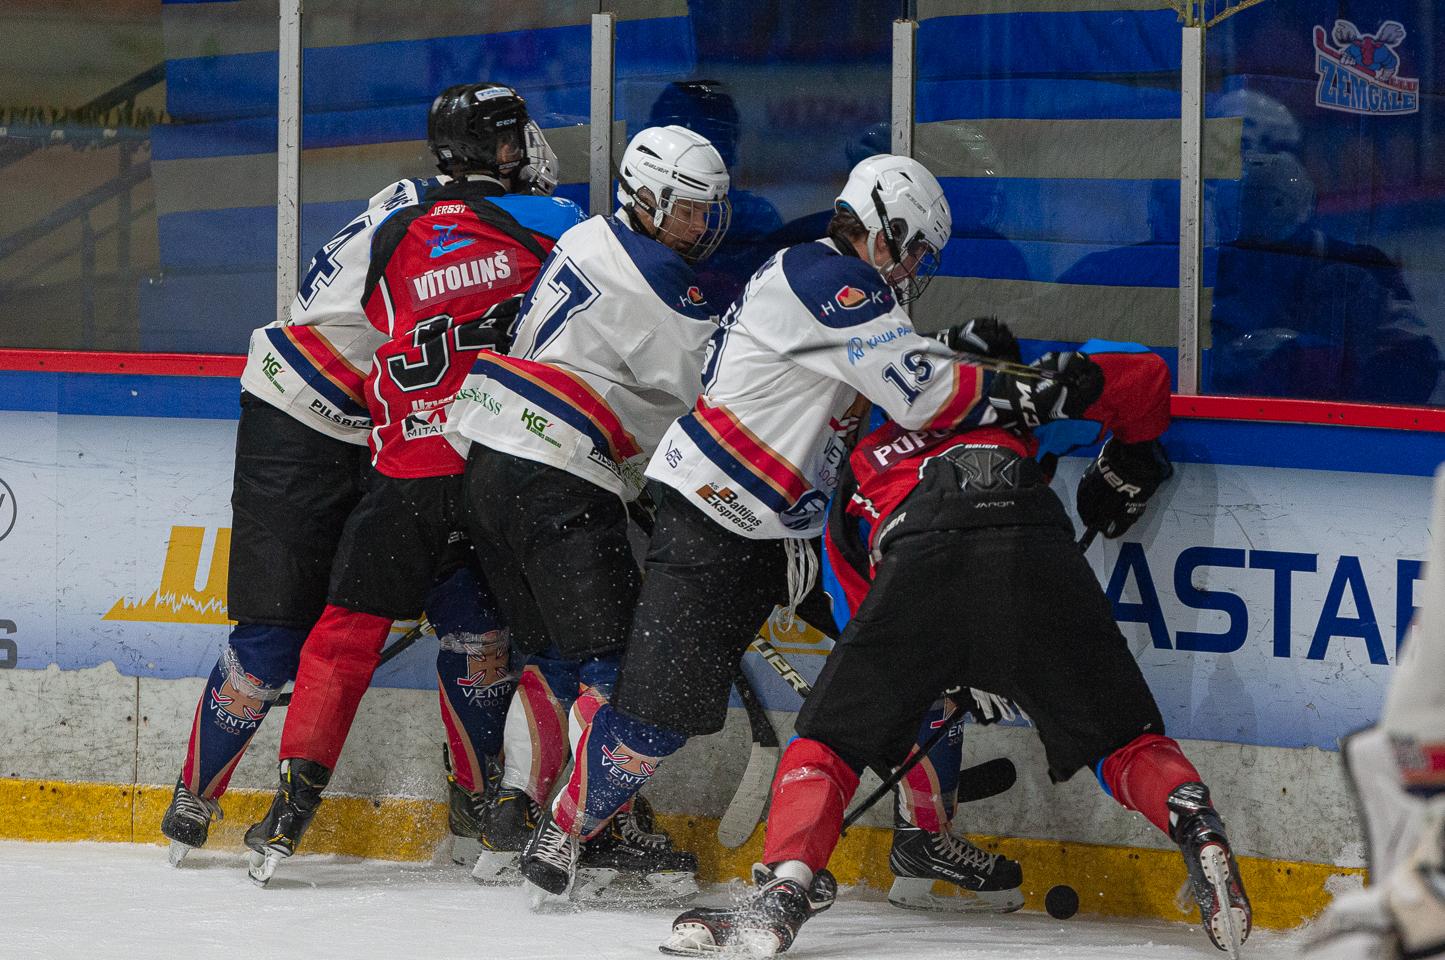 Jelgavas hokeja skola JLSS U17 - Venta 2002 14092019-25